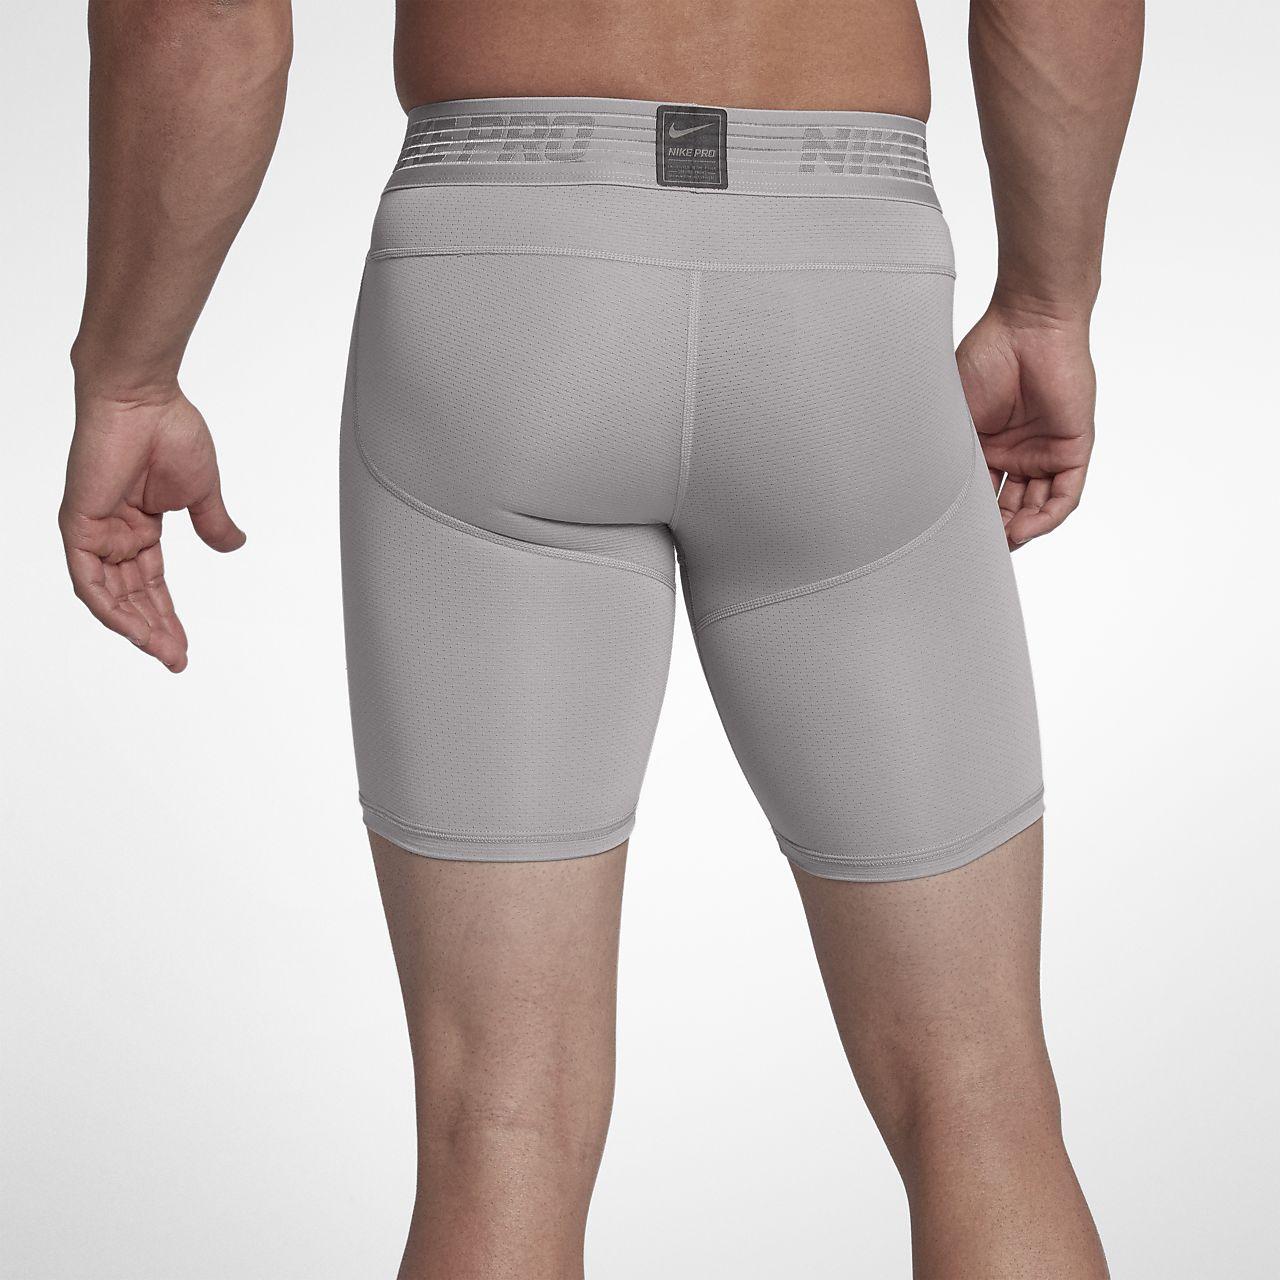 53424357fc3 Nike Pro HyperCool Men's Training Shorts